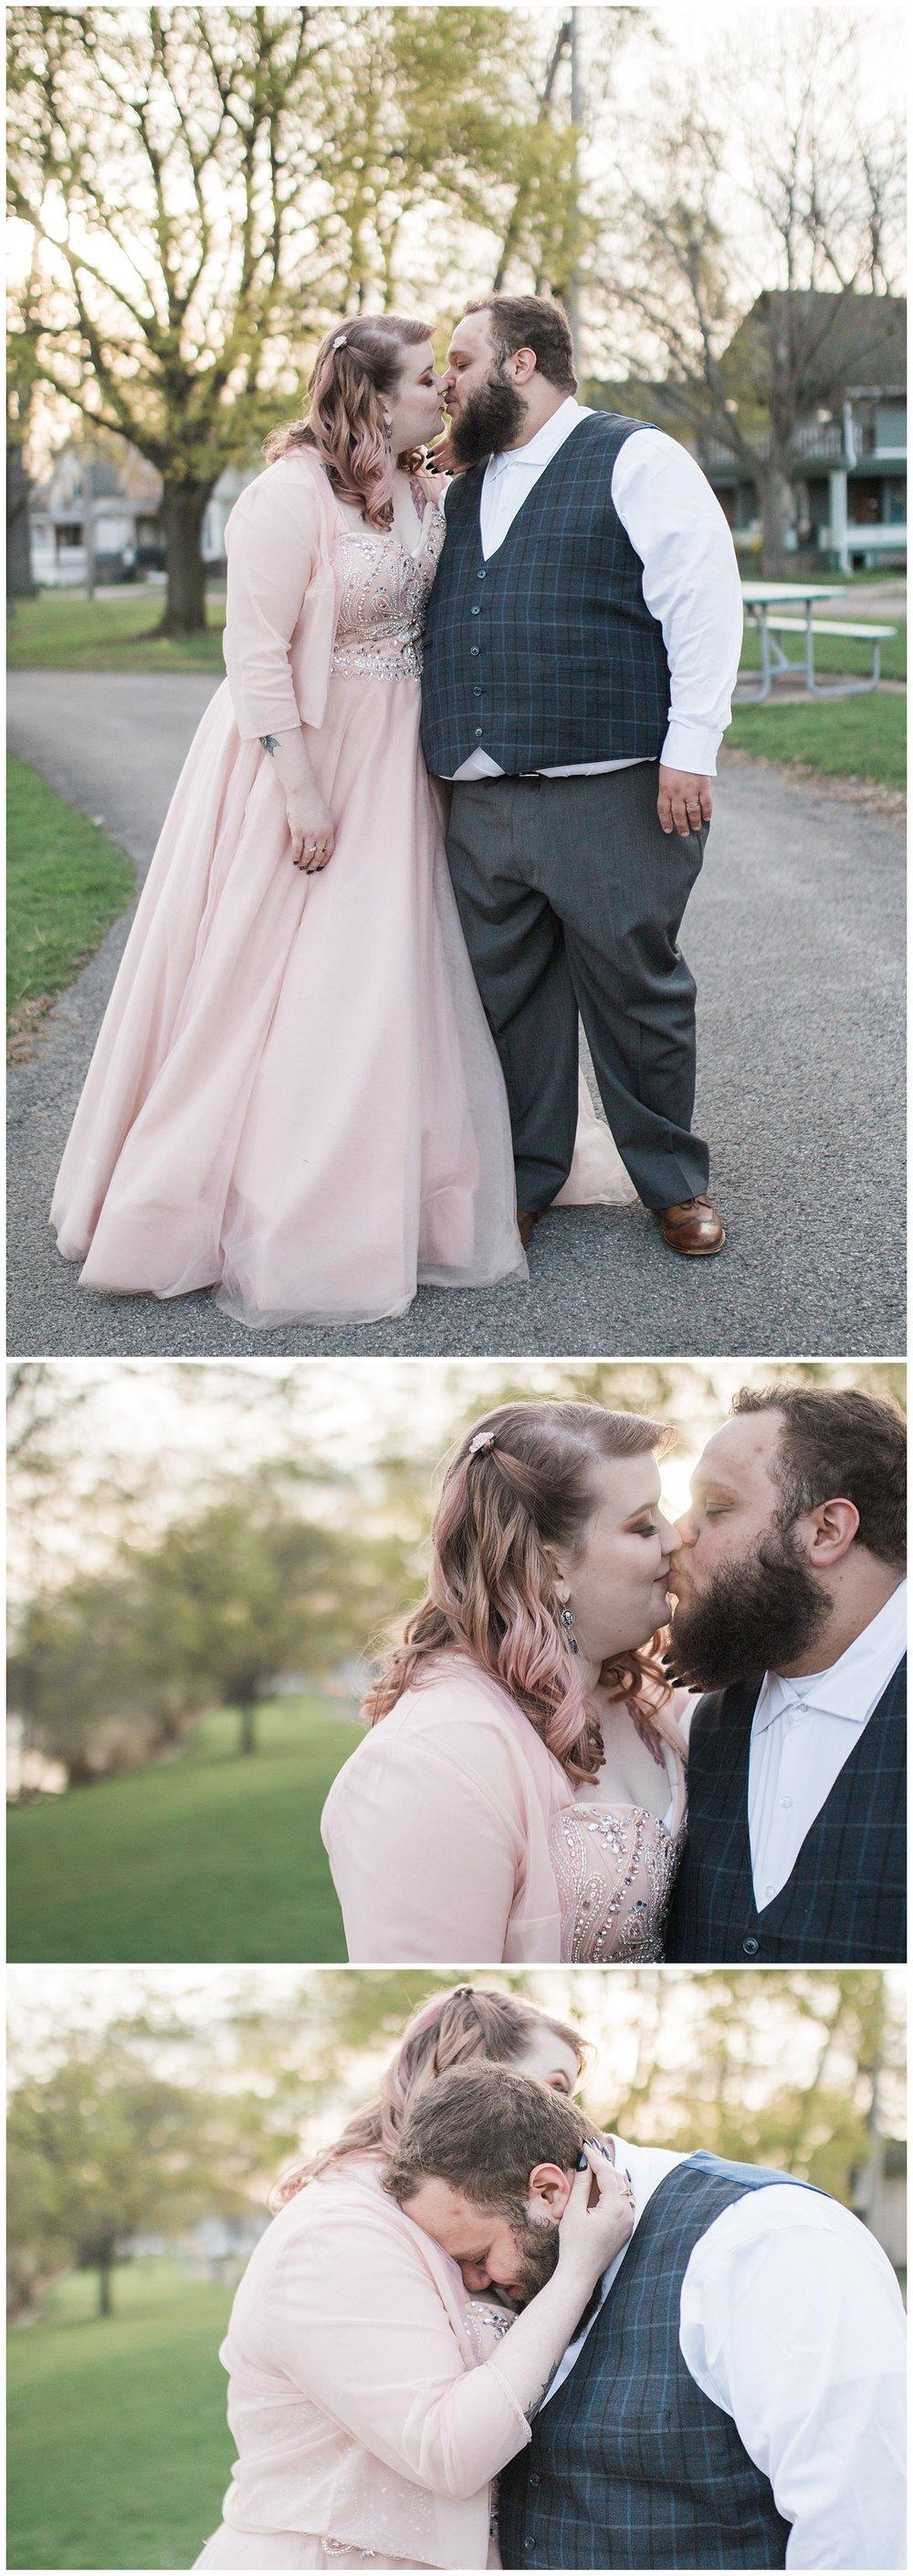 Emily and Felix Cruz - Buffalo Erie Canal - Lass and Beau-1604_Buffalo wedding photography.jpg